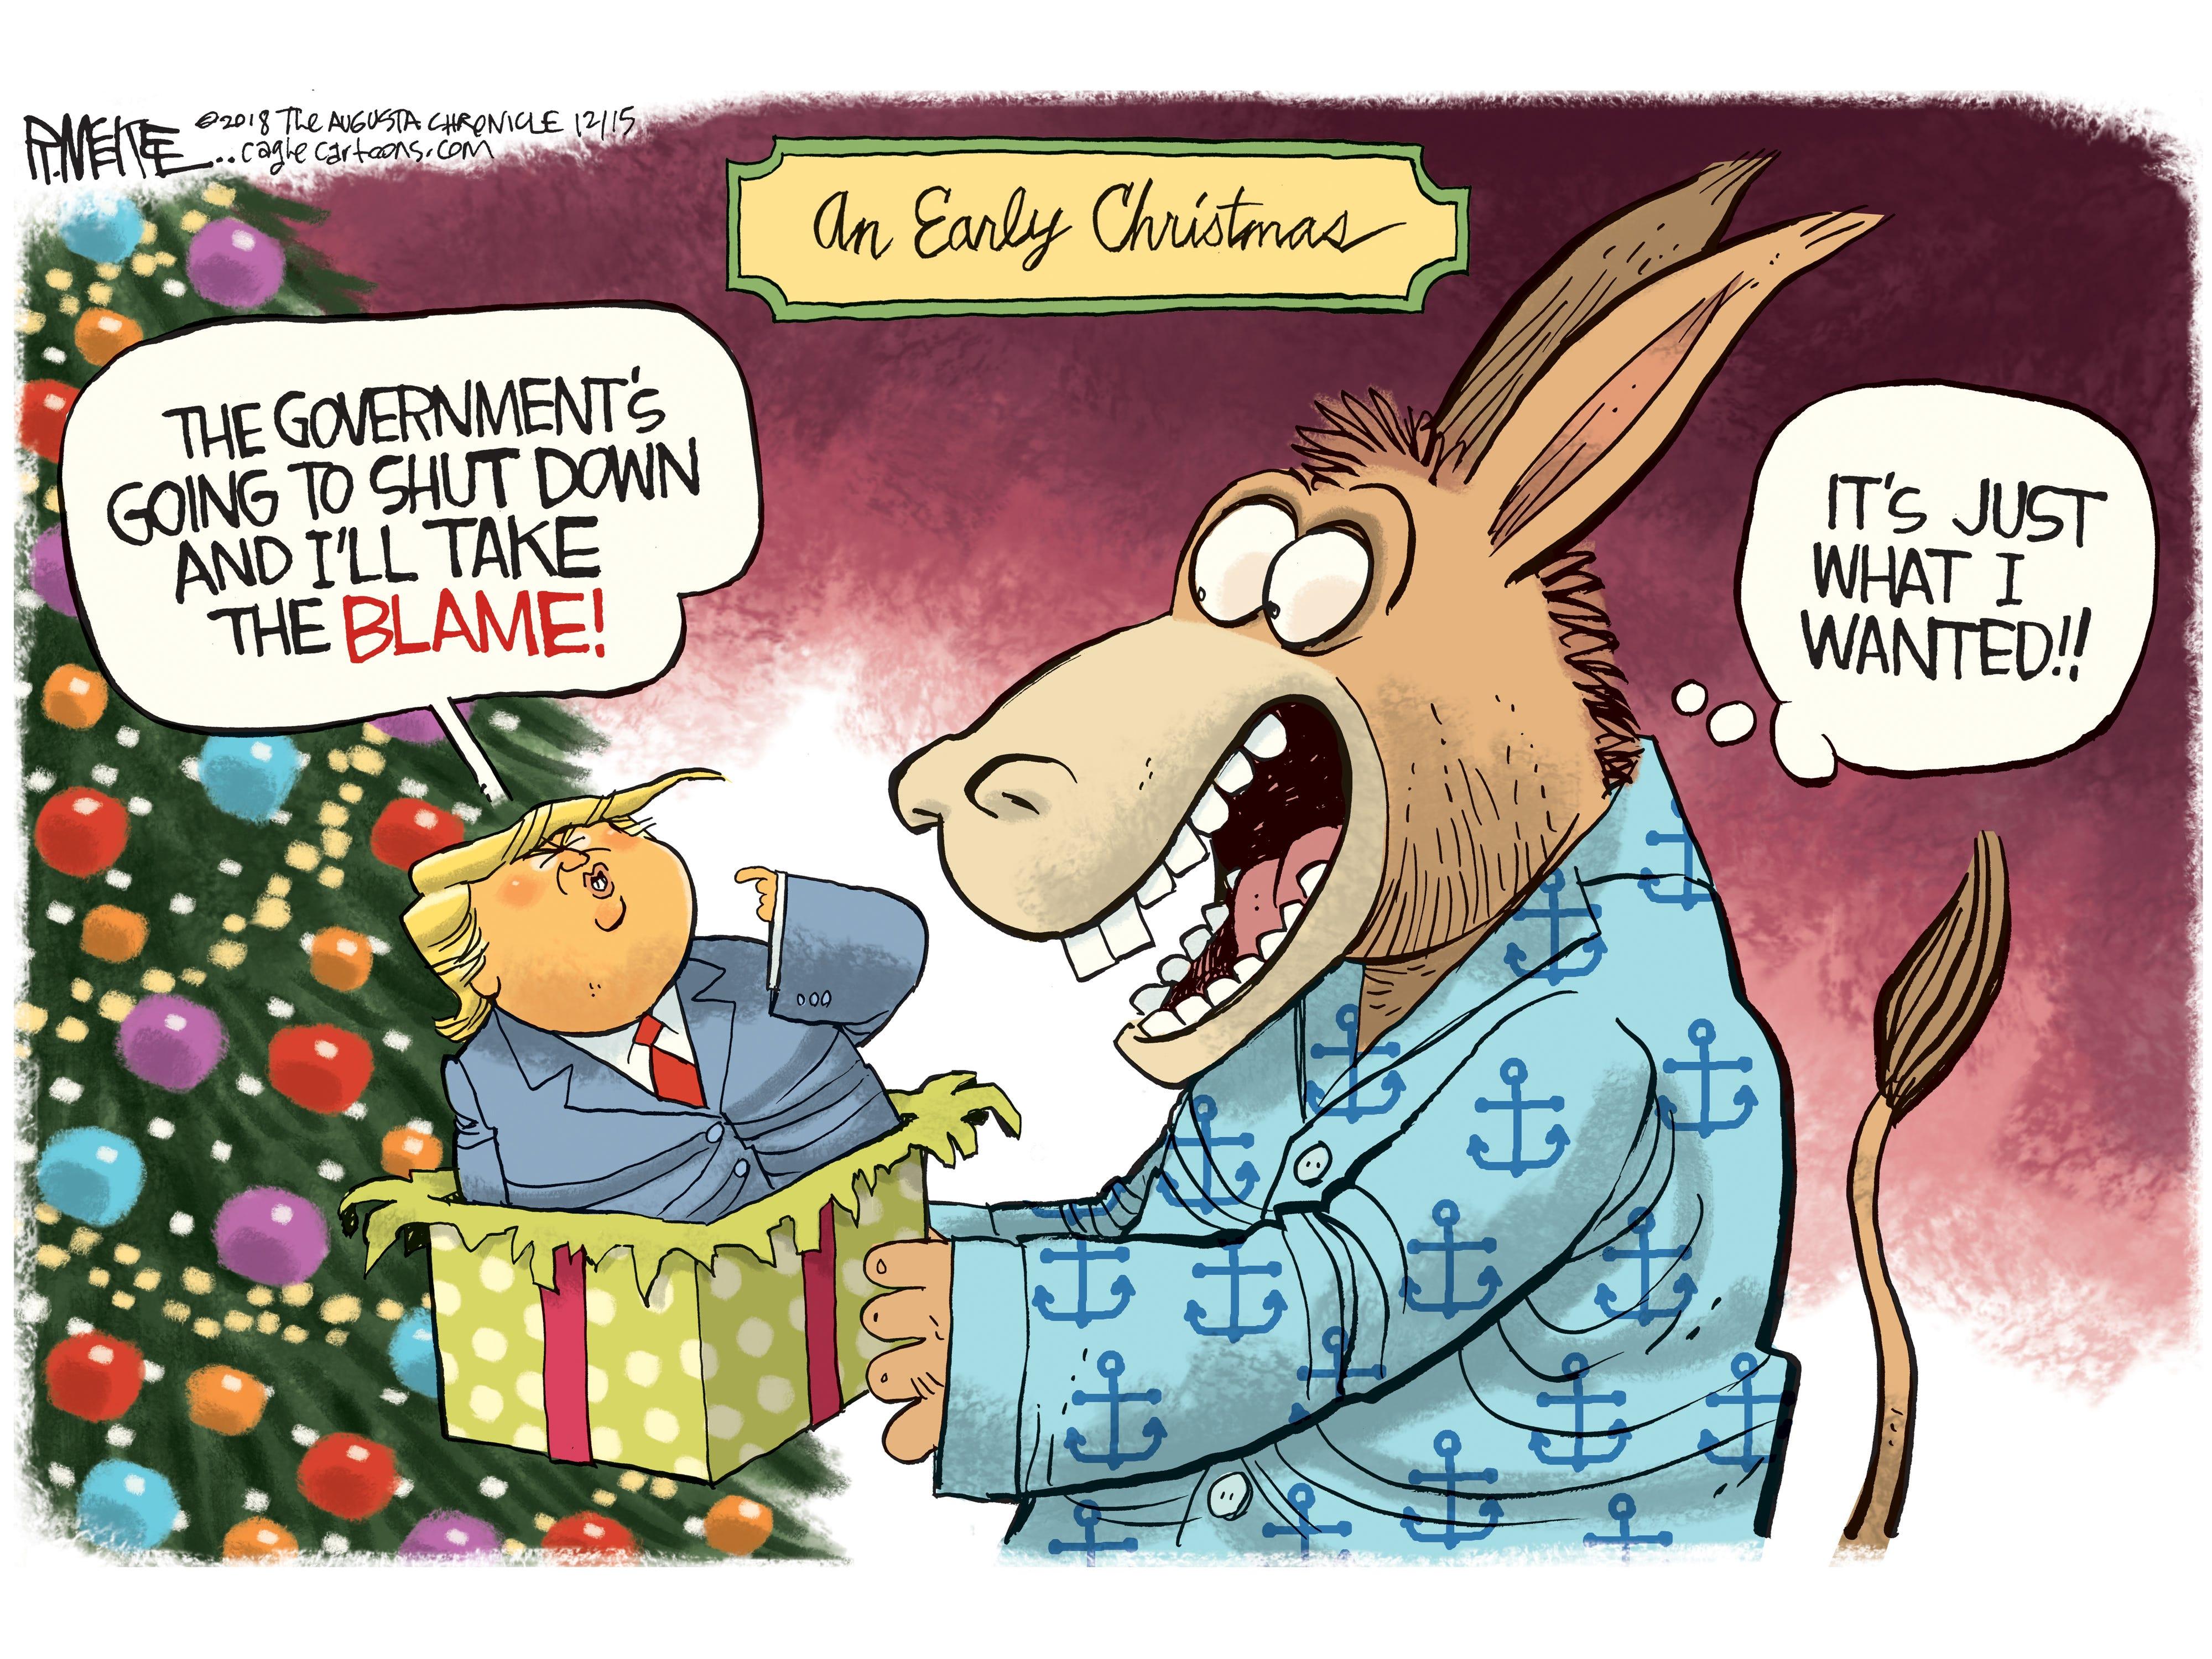 Dec. 18, 2018